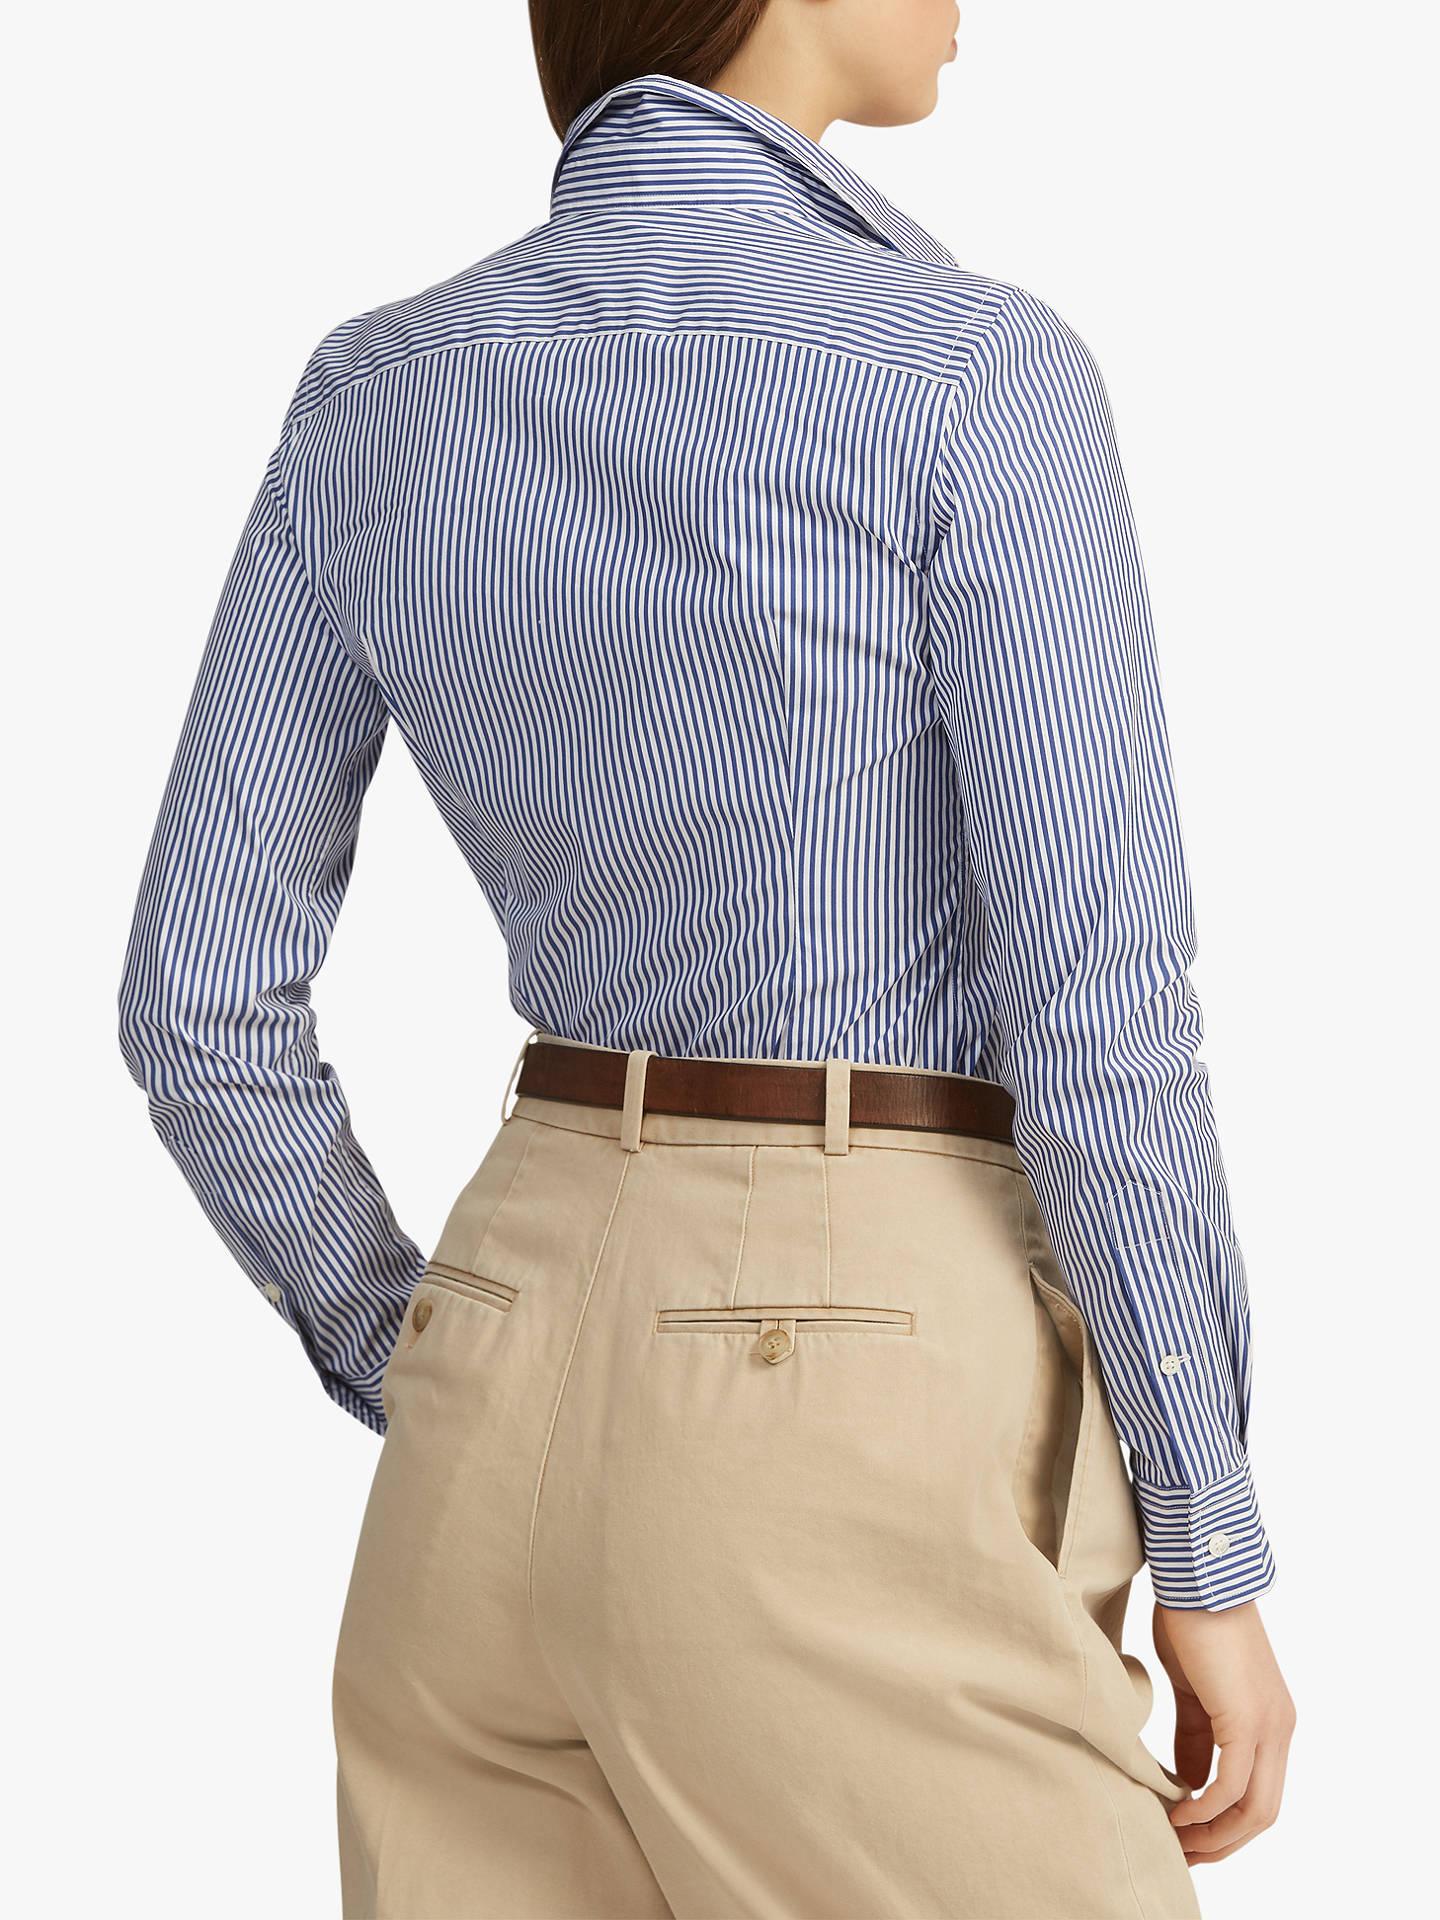 Significativo alluvione Indosso vestiti  Polo Ralph Lauren Slim Fit Striped Shirt at John Lewis & Partners